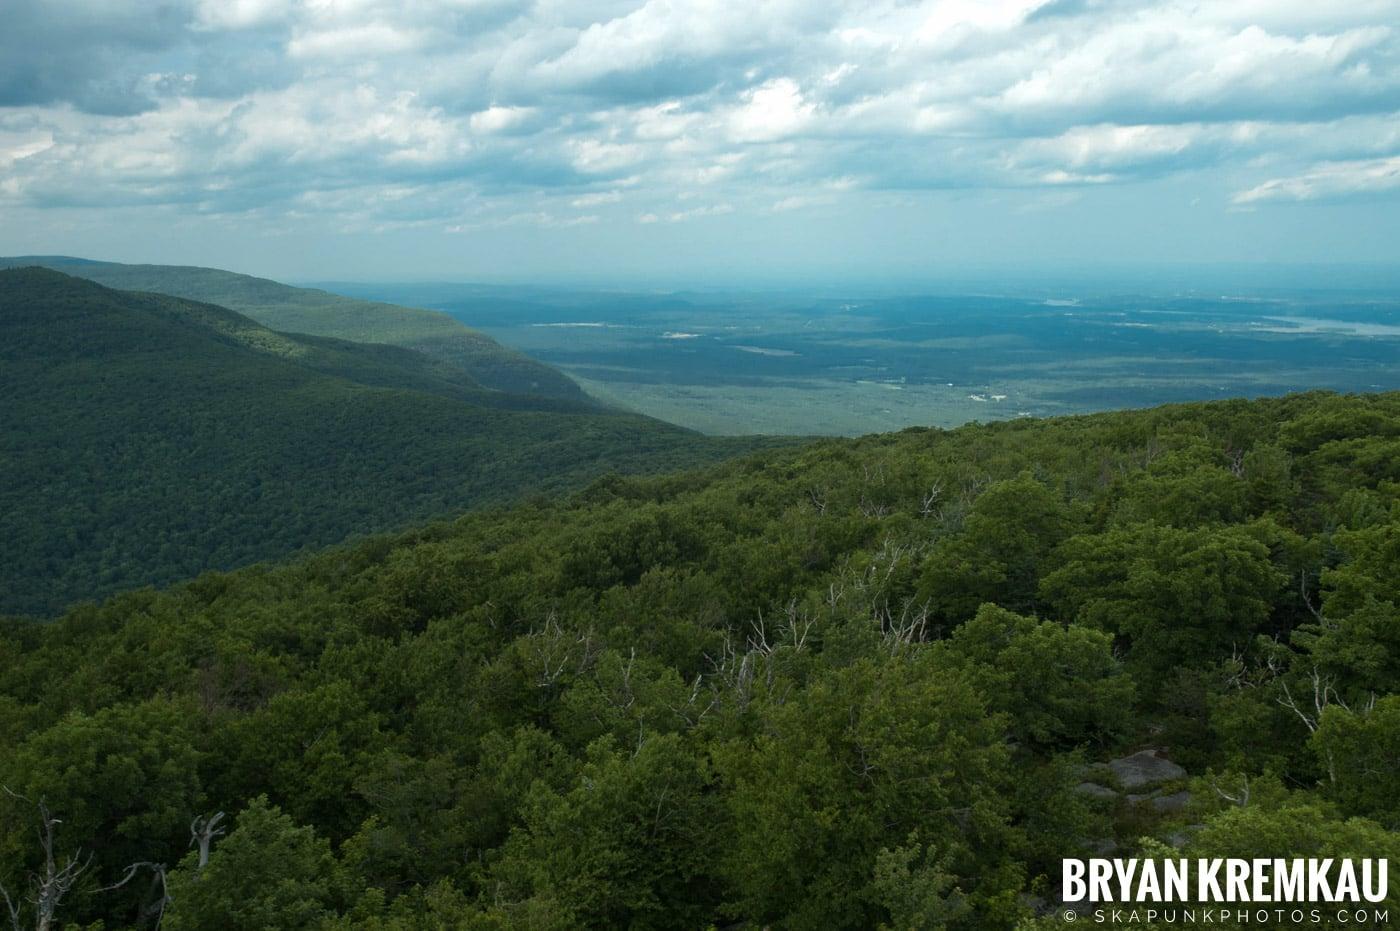 Catskills Overlook Mountain @ Woodstock, NY - 6.24.07 (2)